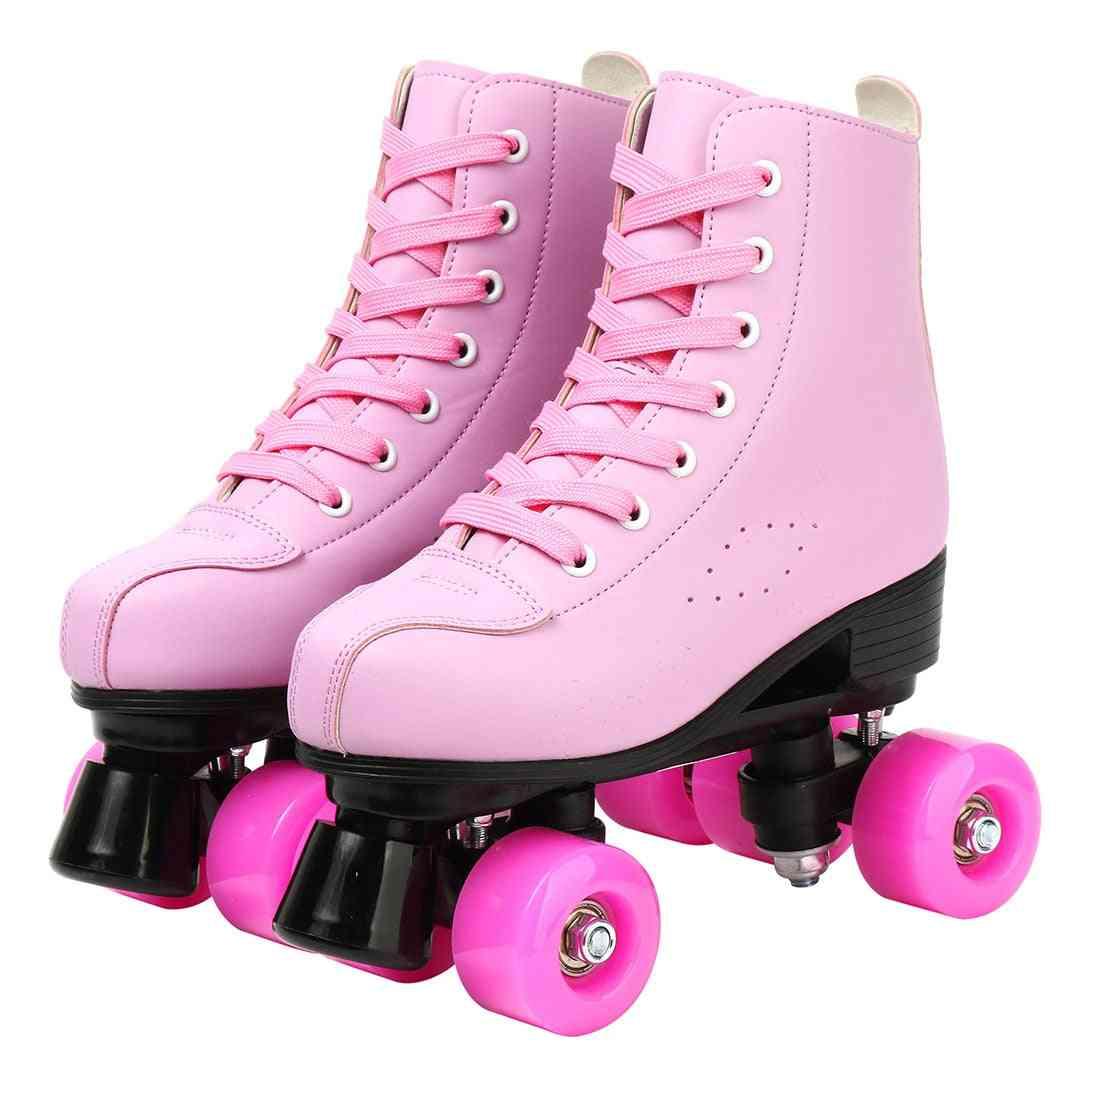 Women Microfiber Roller Skates, Skating Shoes